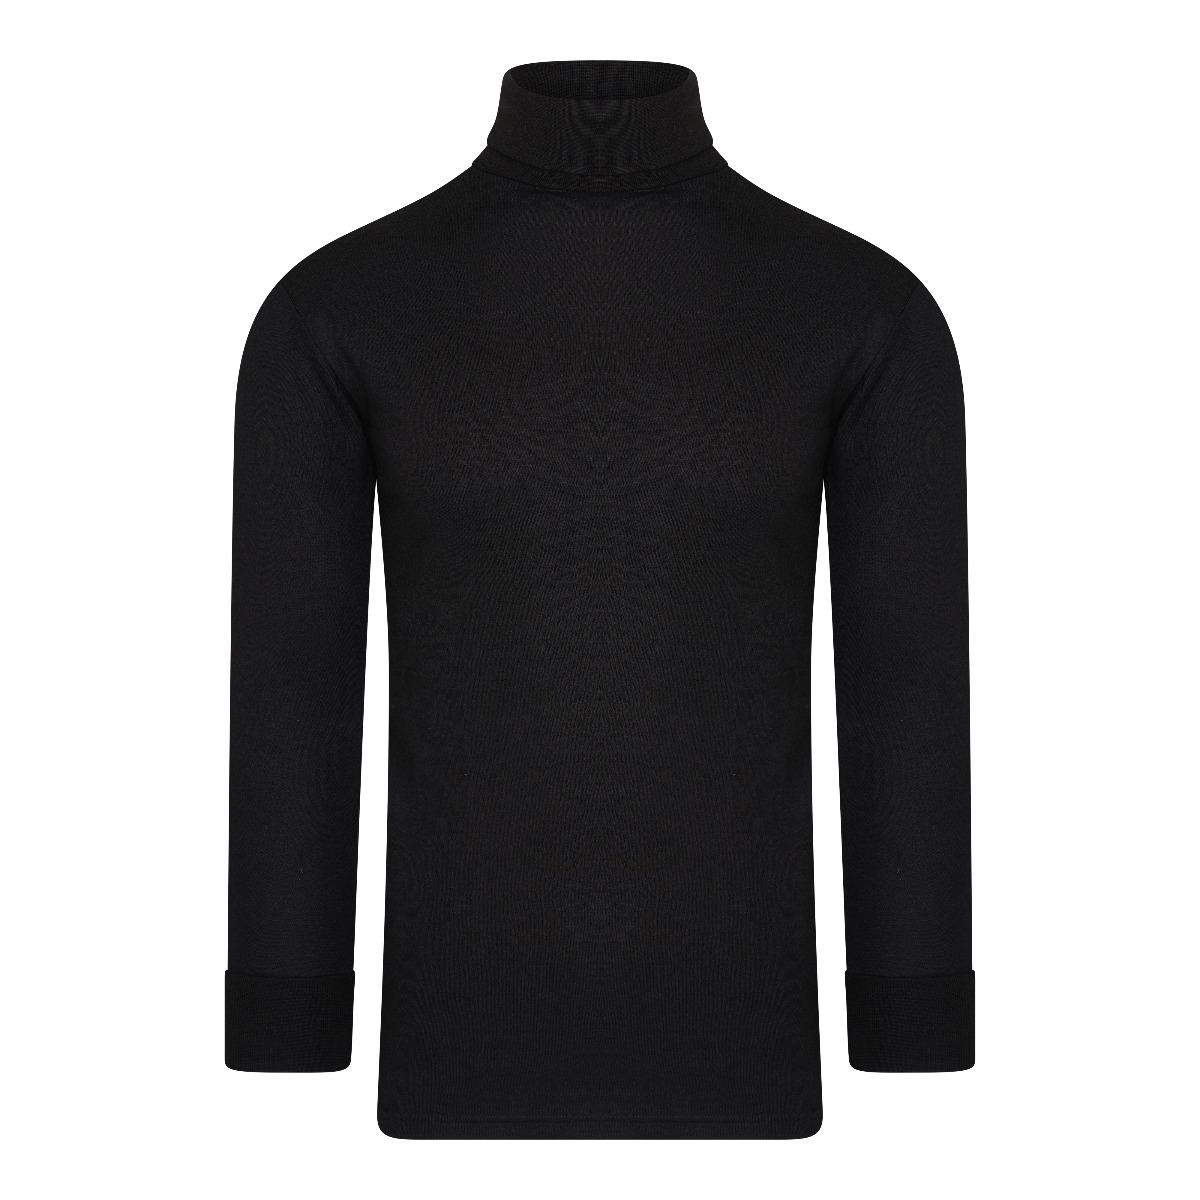 Beeren Thermo Unisex Shirt Col Lange Mouw Zwart Xxl